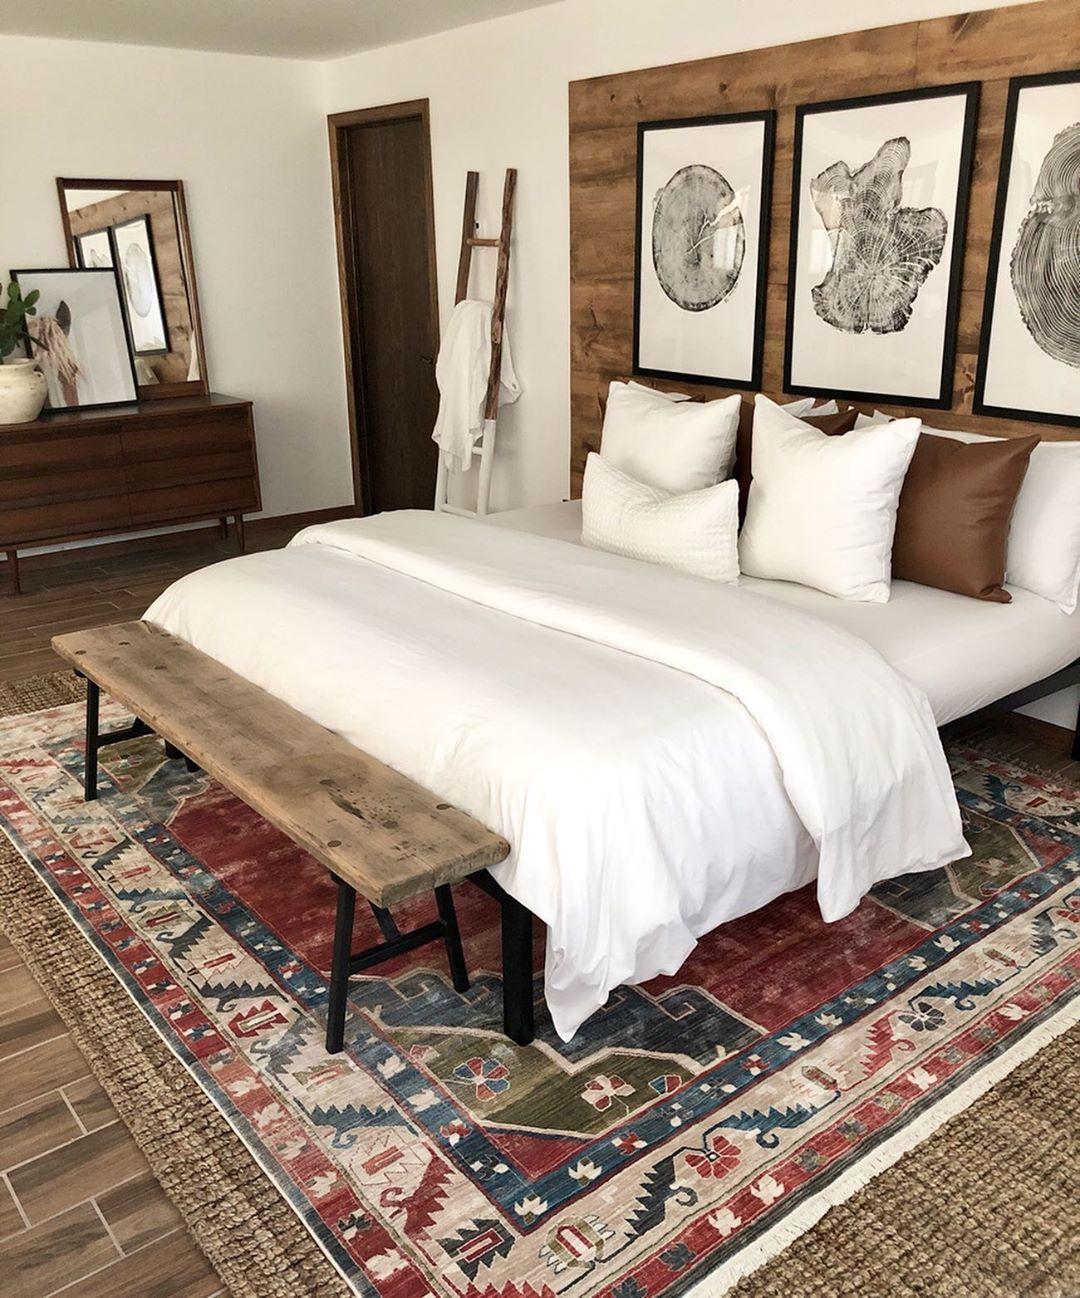 Kate Chipinski On Instagram Organic Chemical Free Mattress How Cool Is That Sponsored As Most O Bedroom Design Home Decor Bedroom Elegant Bedroom Design